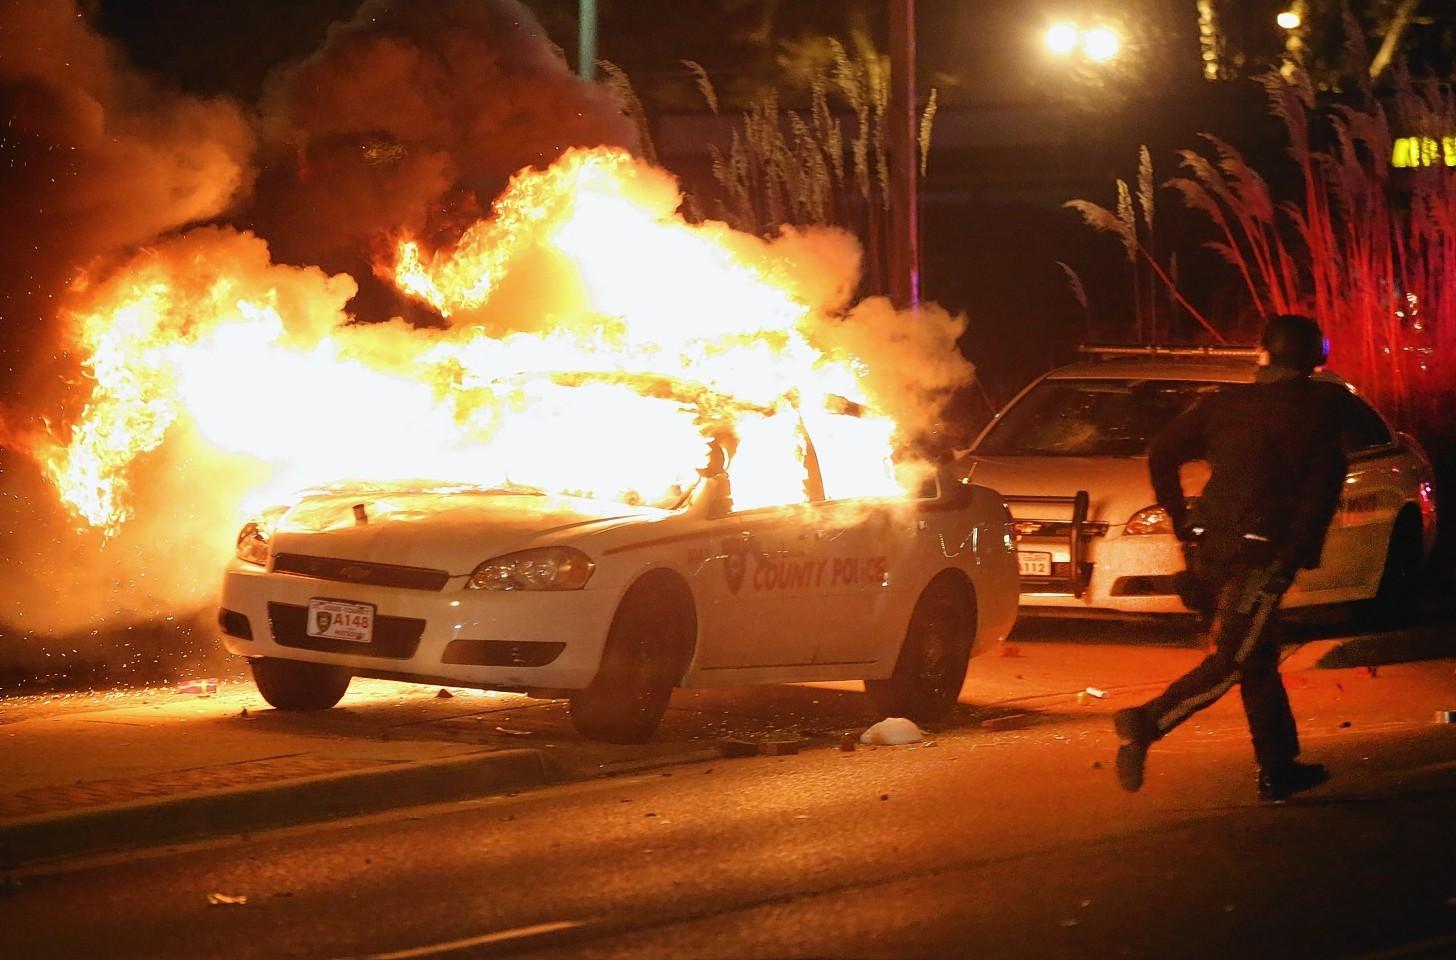 Cars have been set alight in Ferguson.